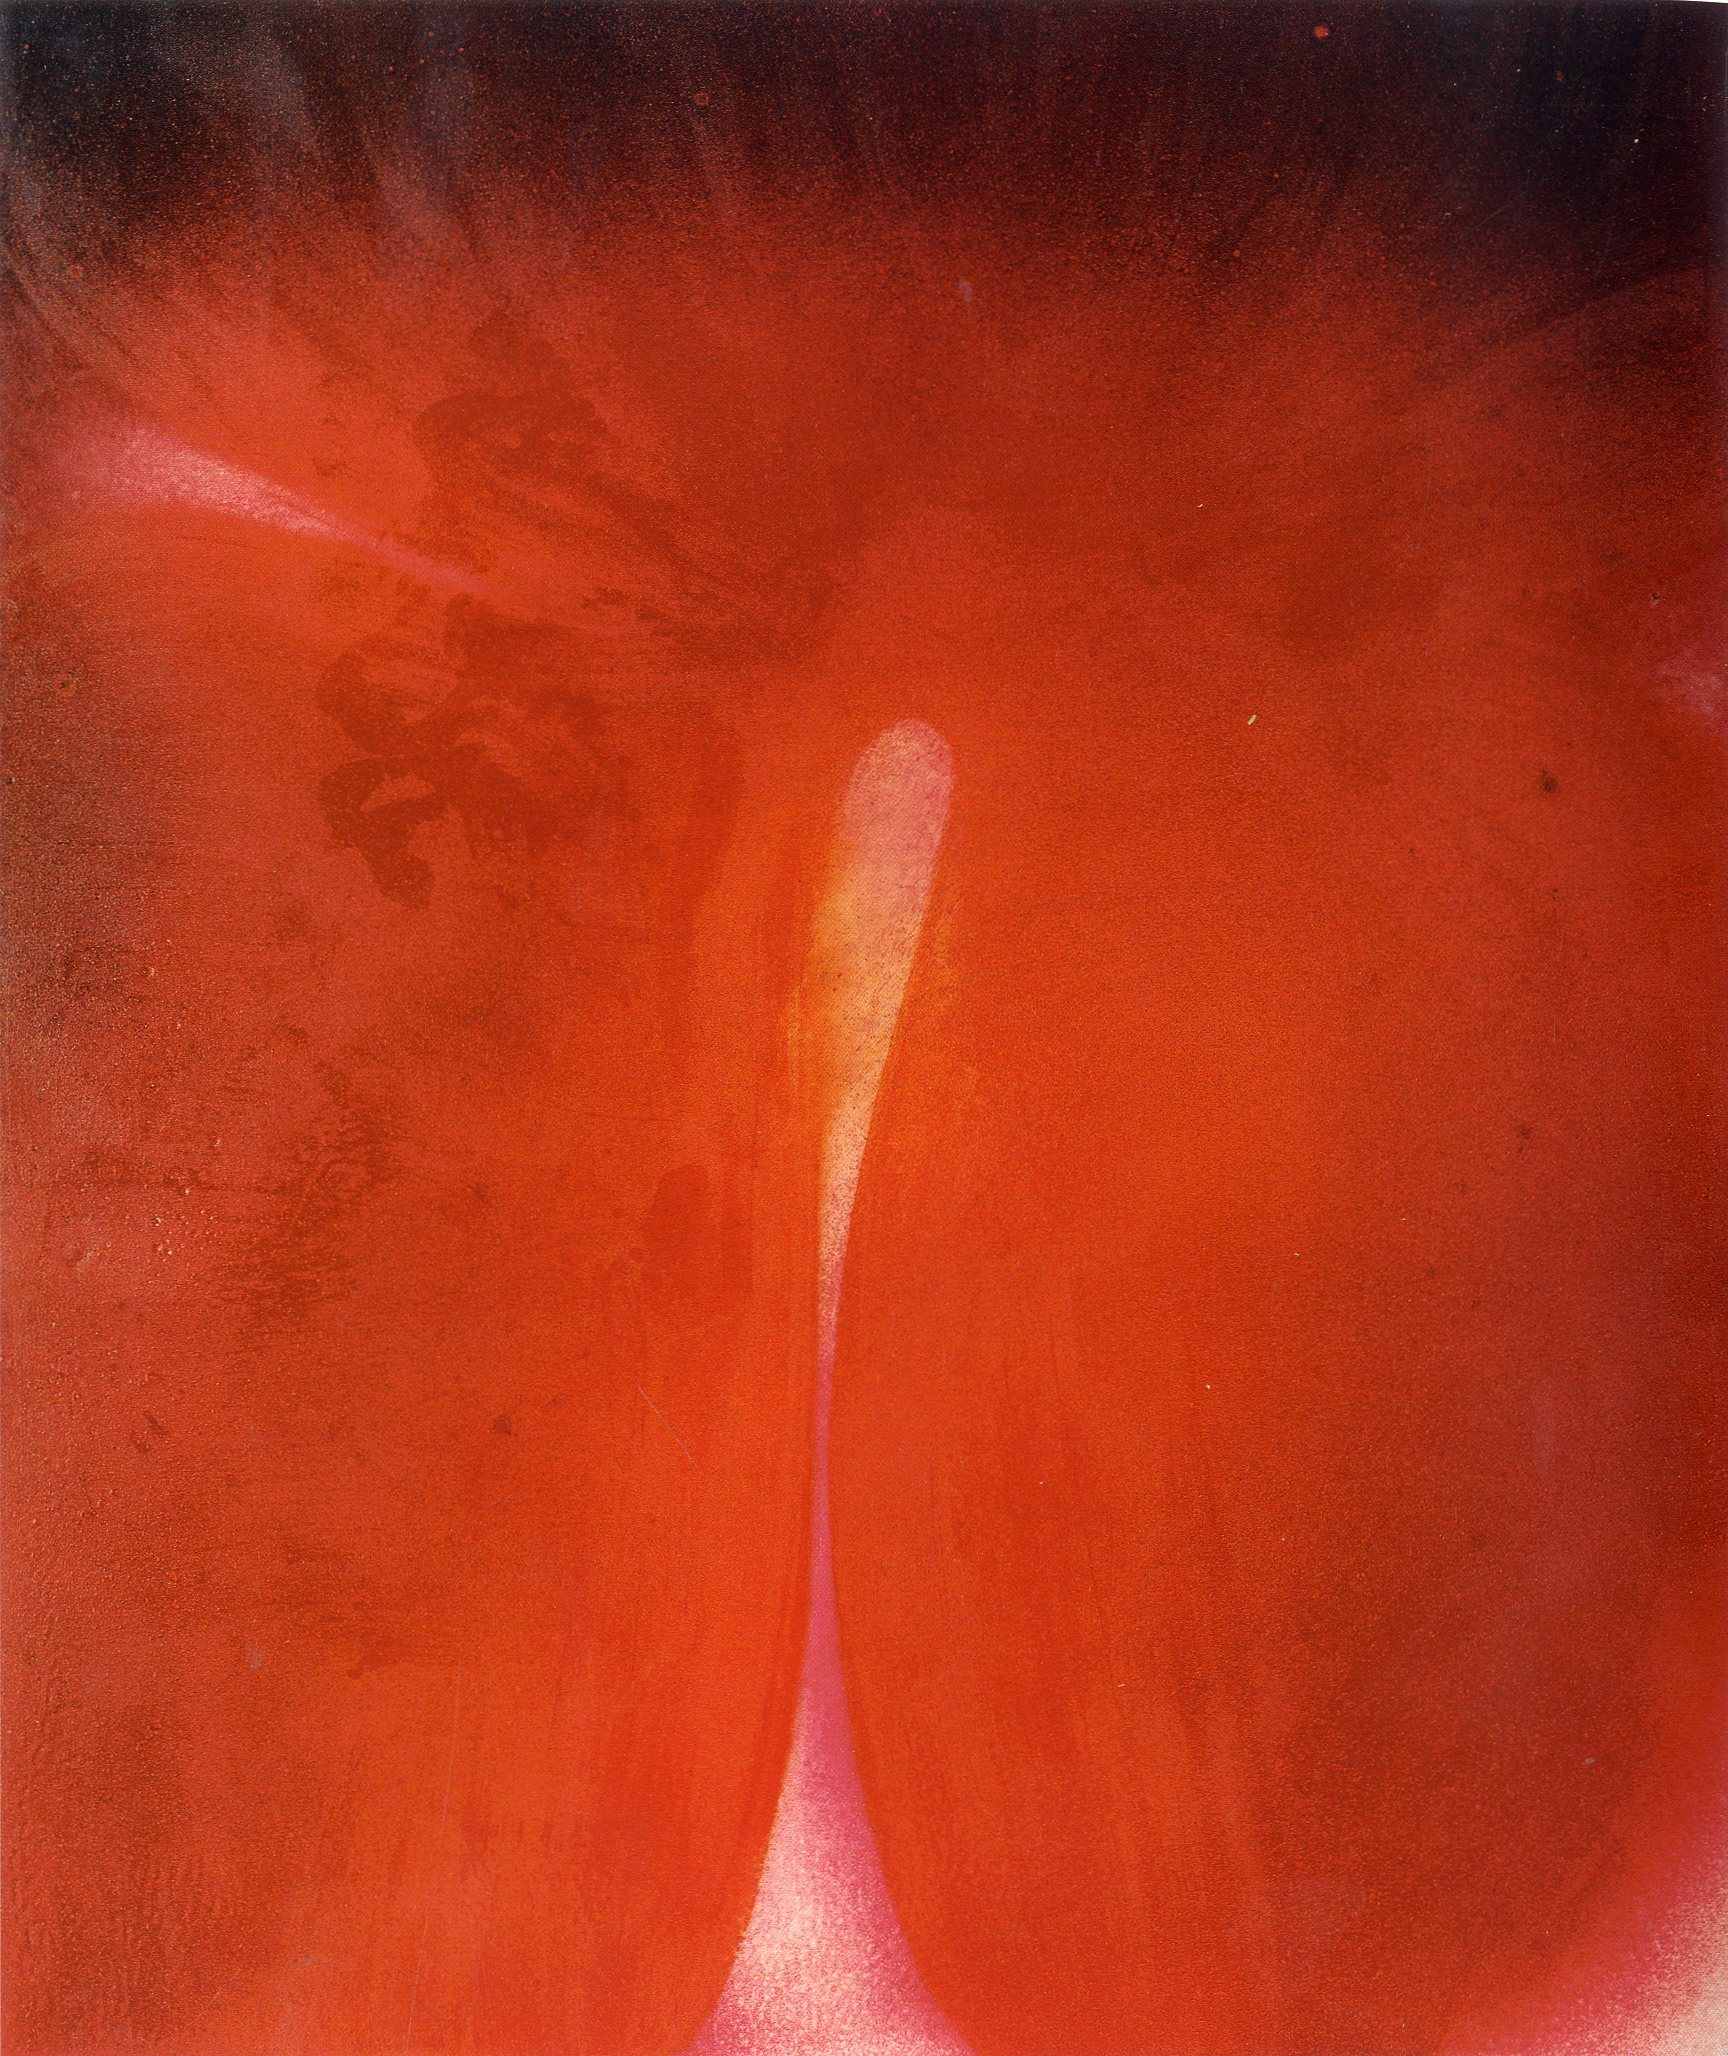 "Serie ""La luz que se apaga"", J.M. Sicilia (2005)"